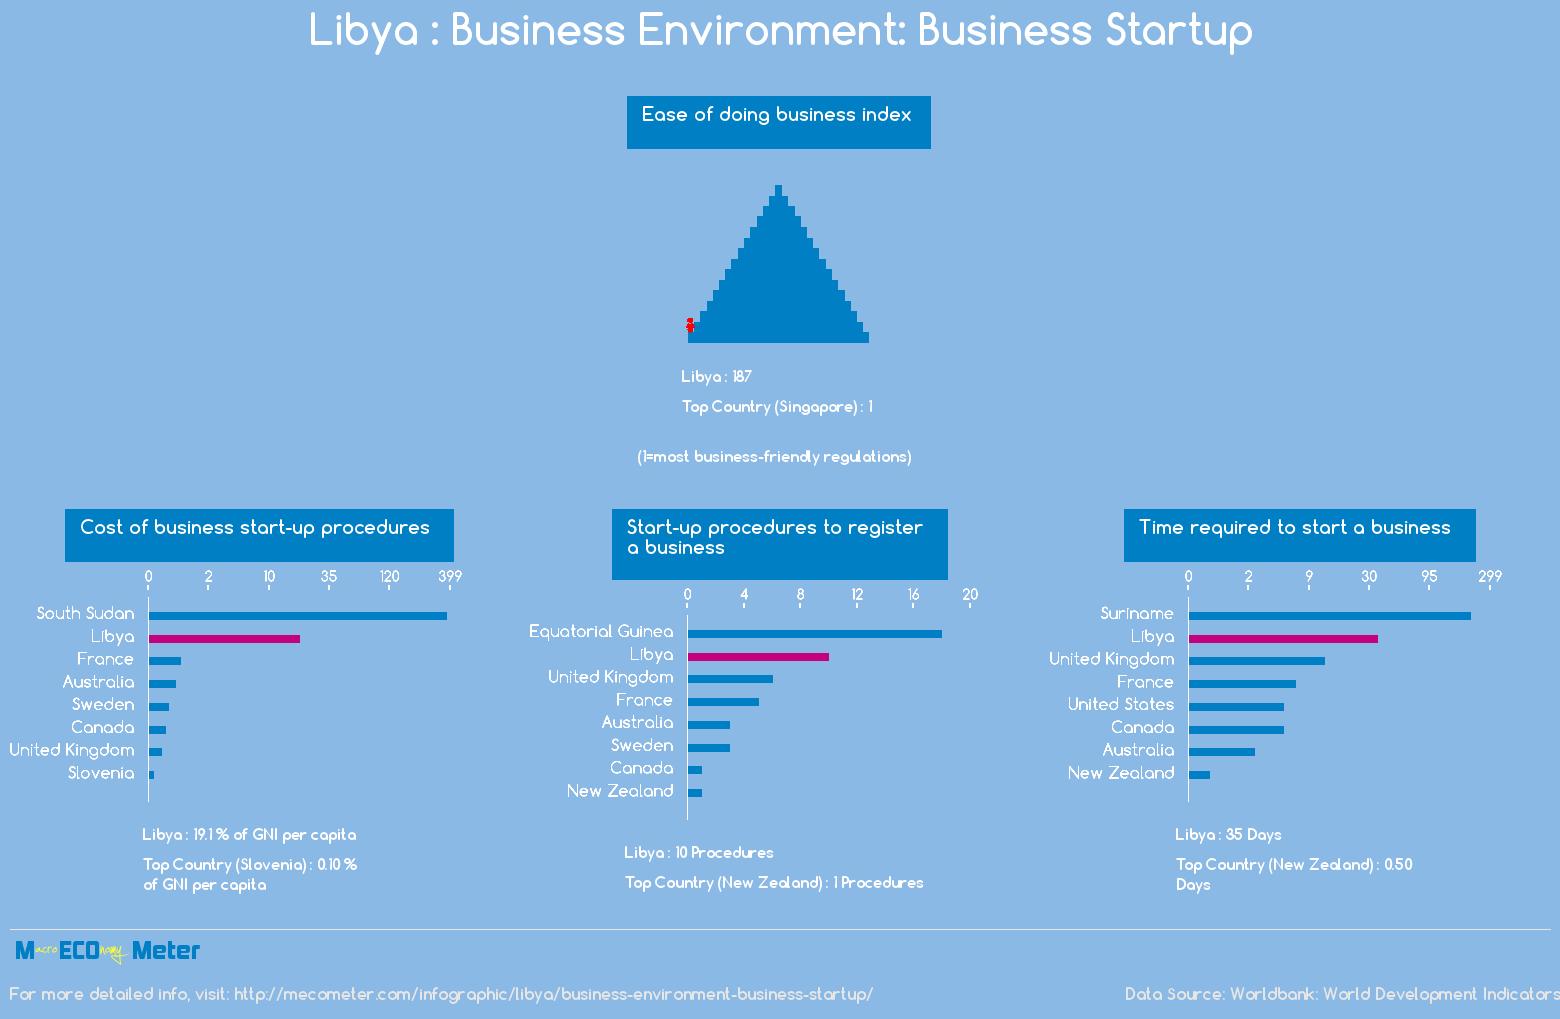 Libya : Business Environment: Business Startup